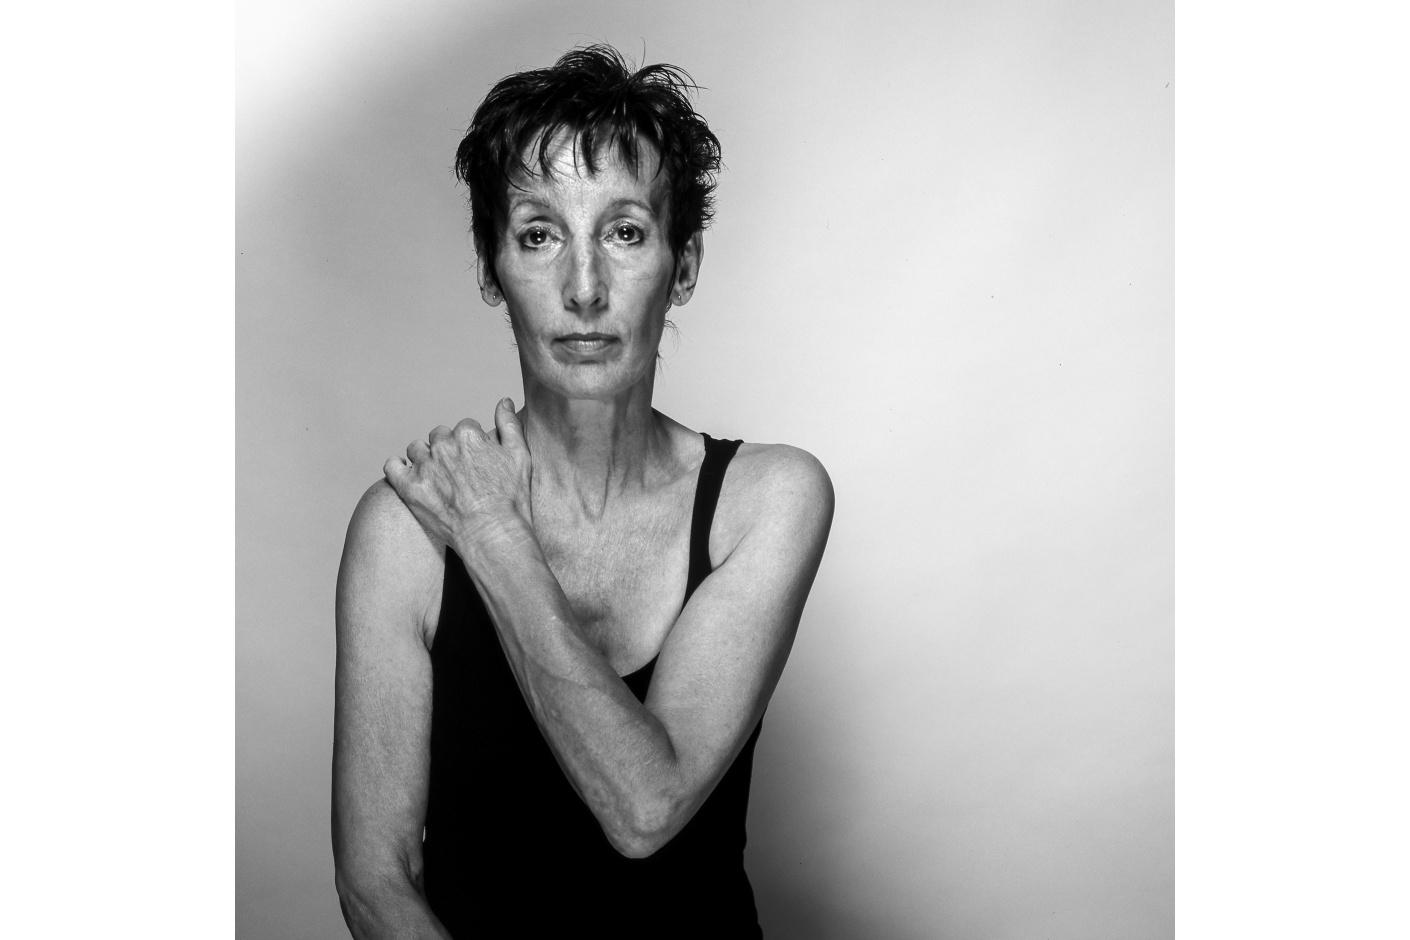 Jelle Pieter de Boer Hasselblad Photography MUM